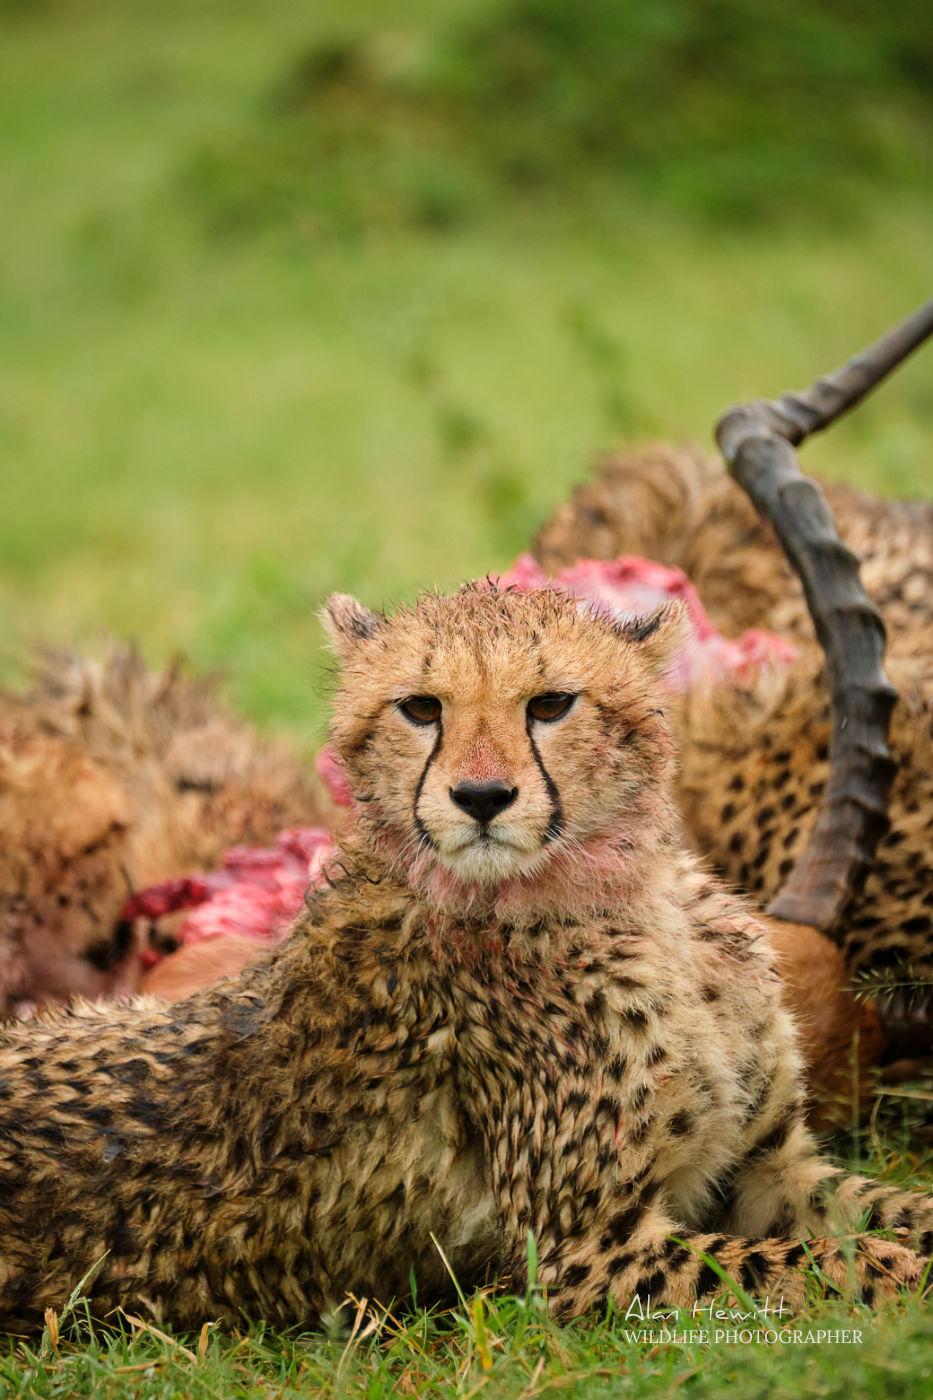 Cheetah FUJIFILM X-T4 Alan Hewitt Photography